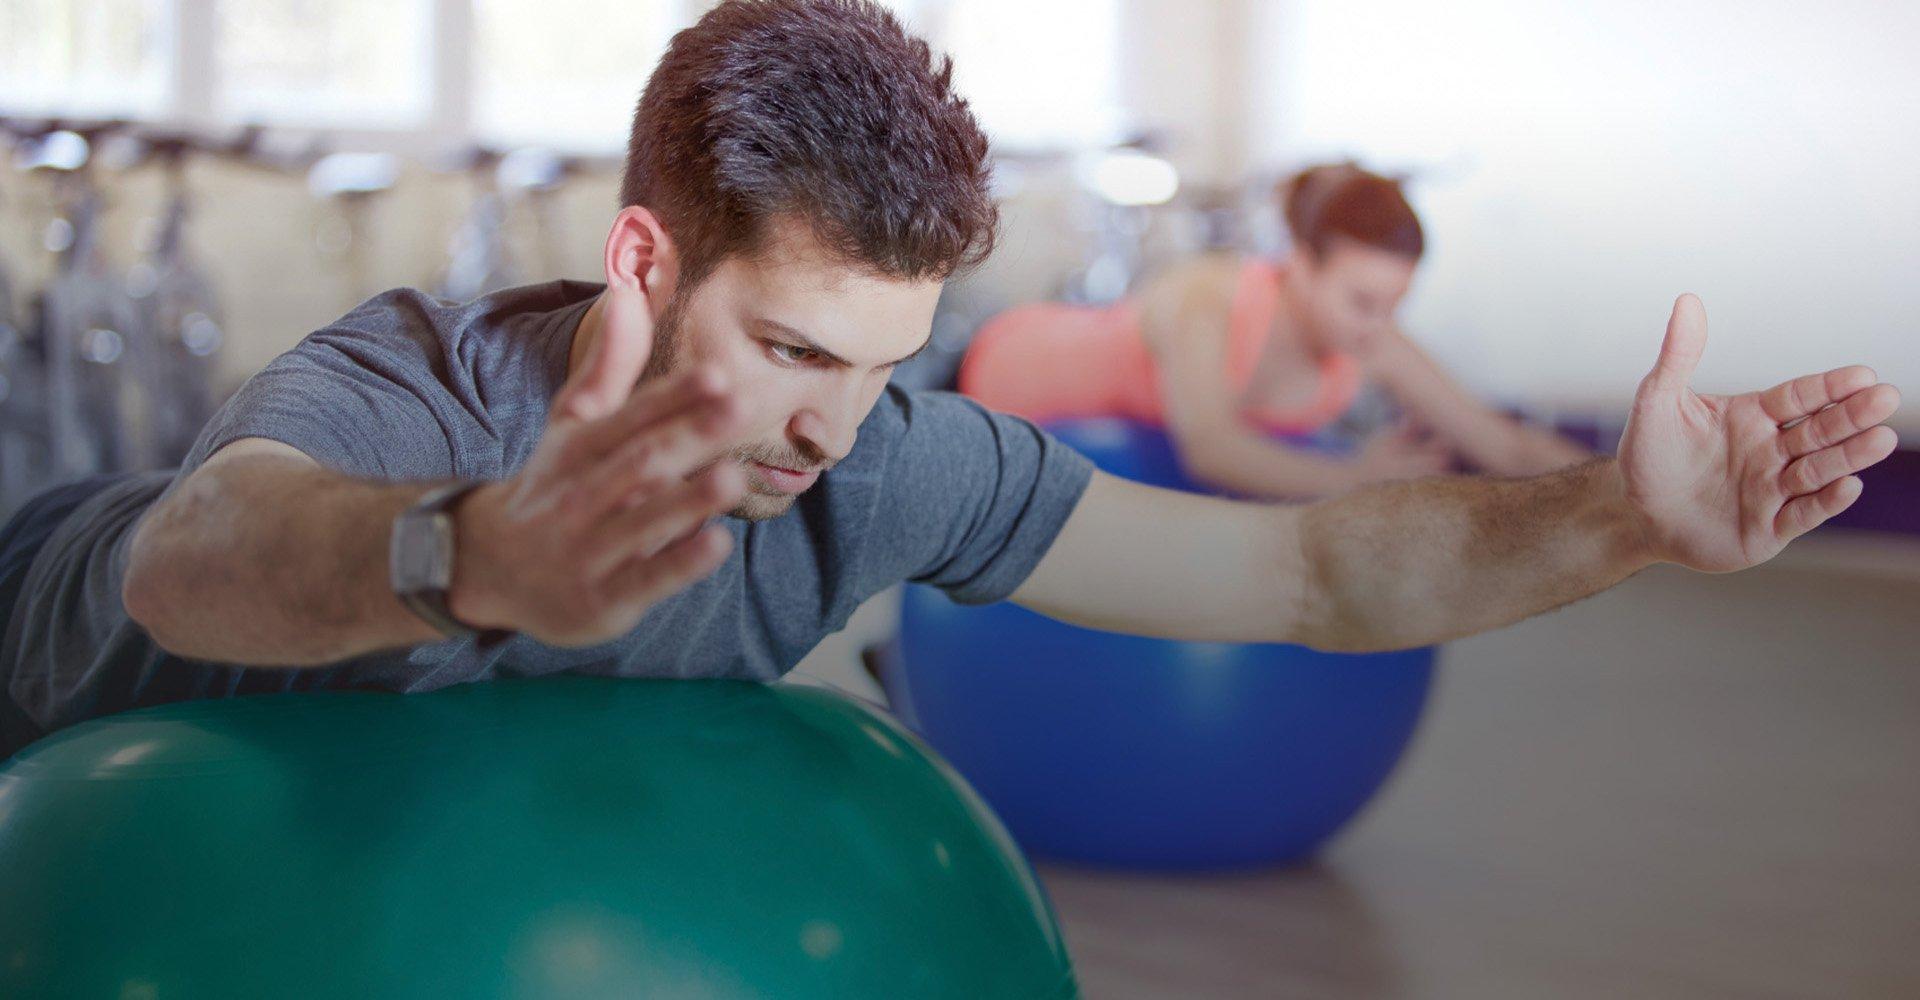 Couple training in fitness studio on gym balls